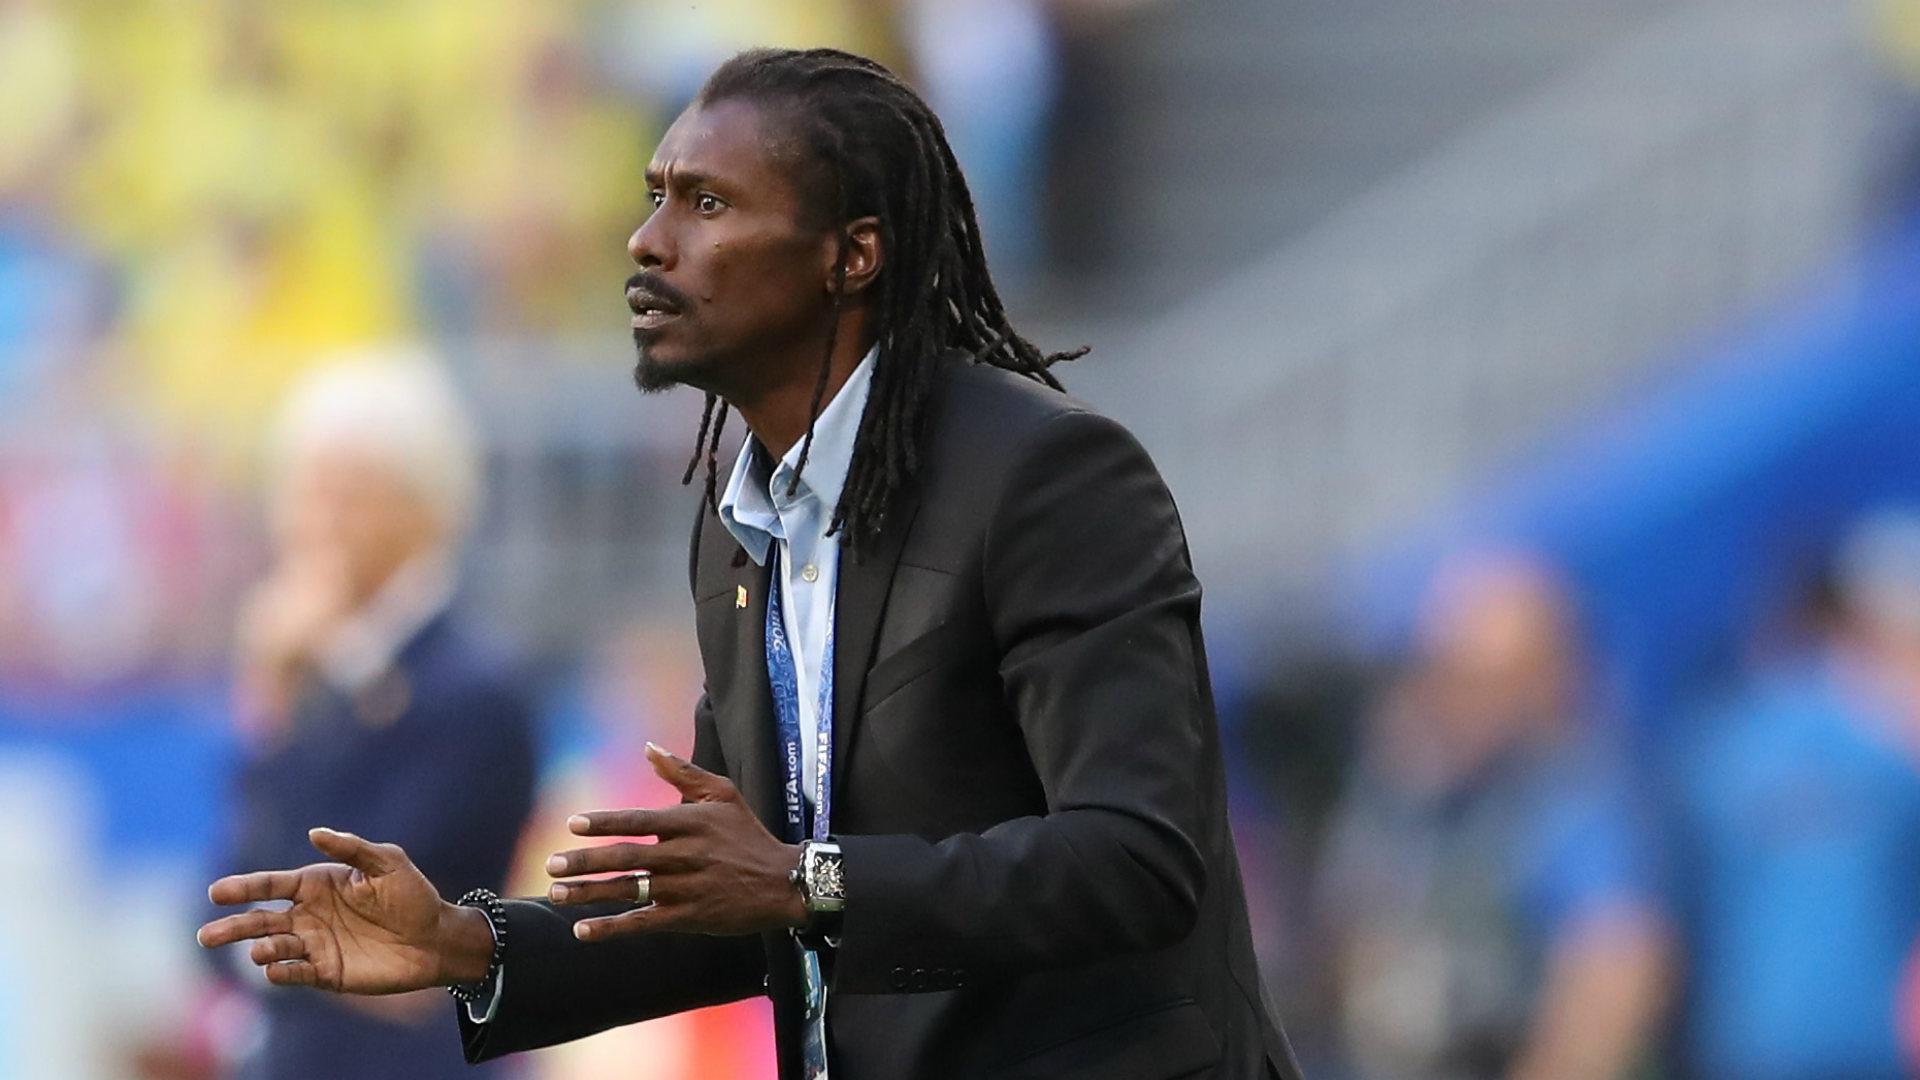 Afcon 2019: Senegal's football is evolving - Coach Aliou Cisse